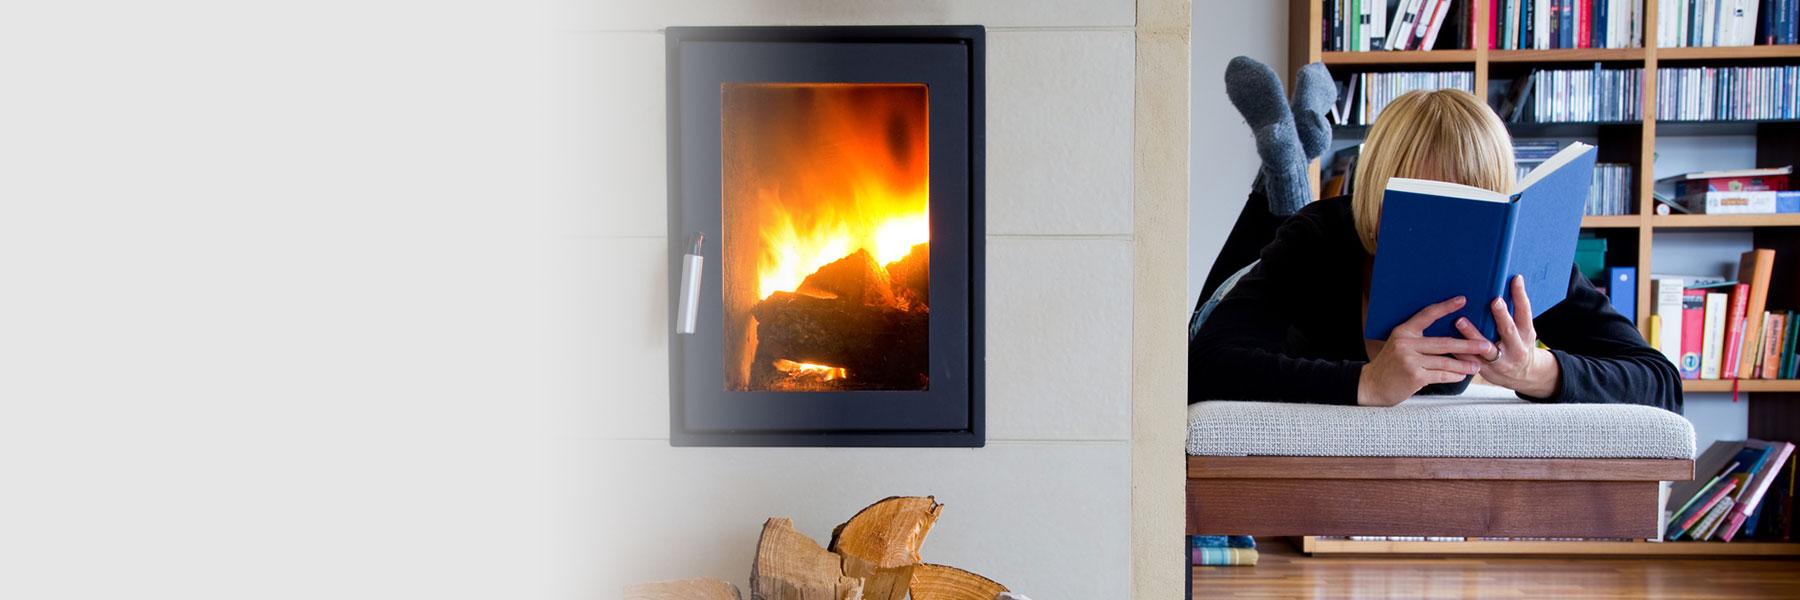 Sliderbild Kälte- und Wärmeschutz